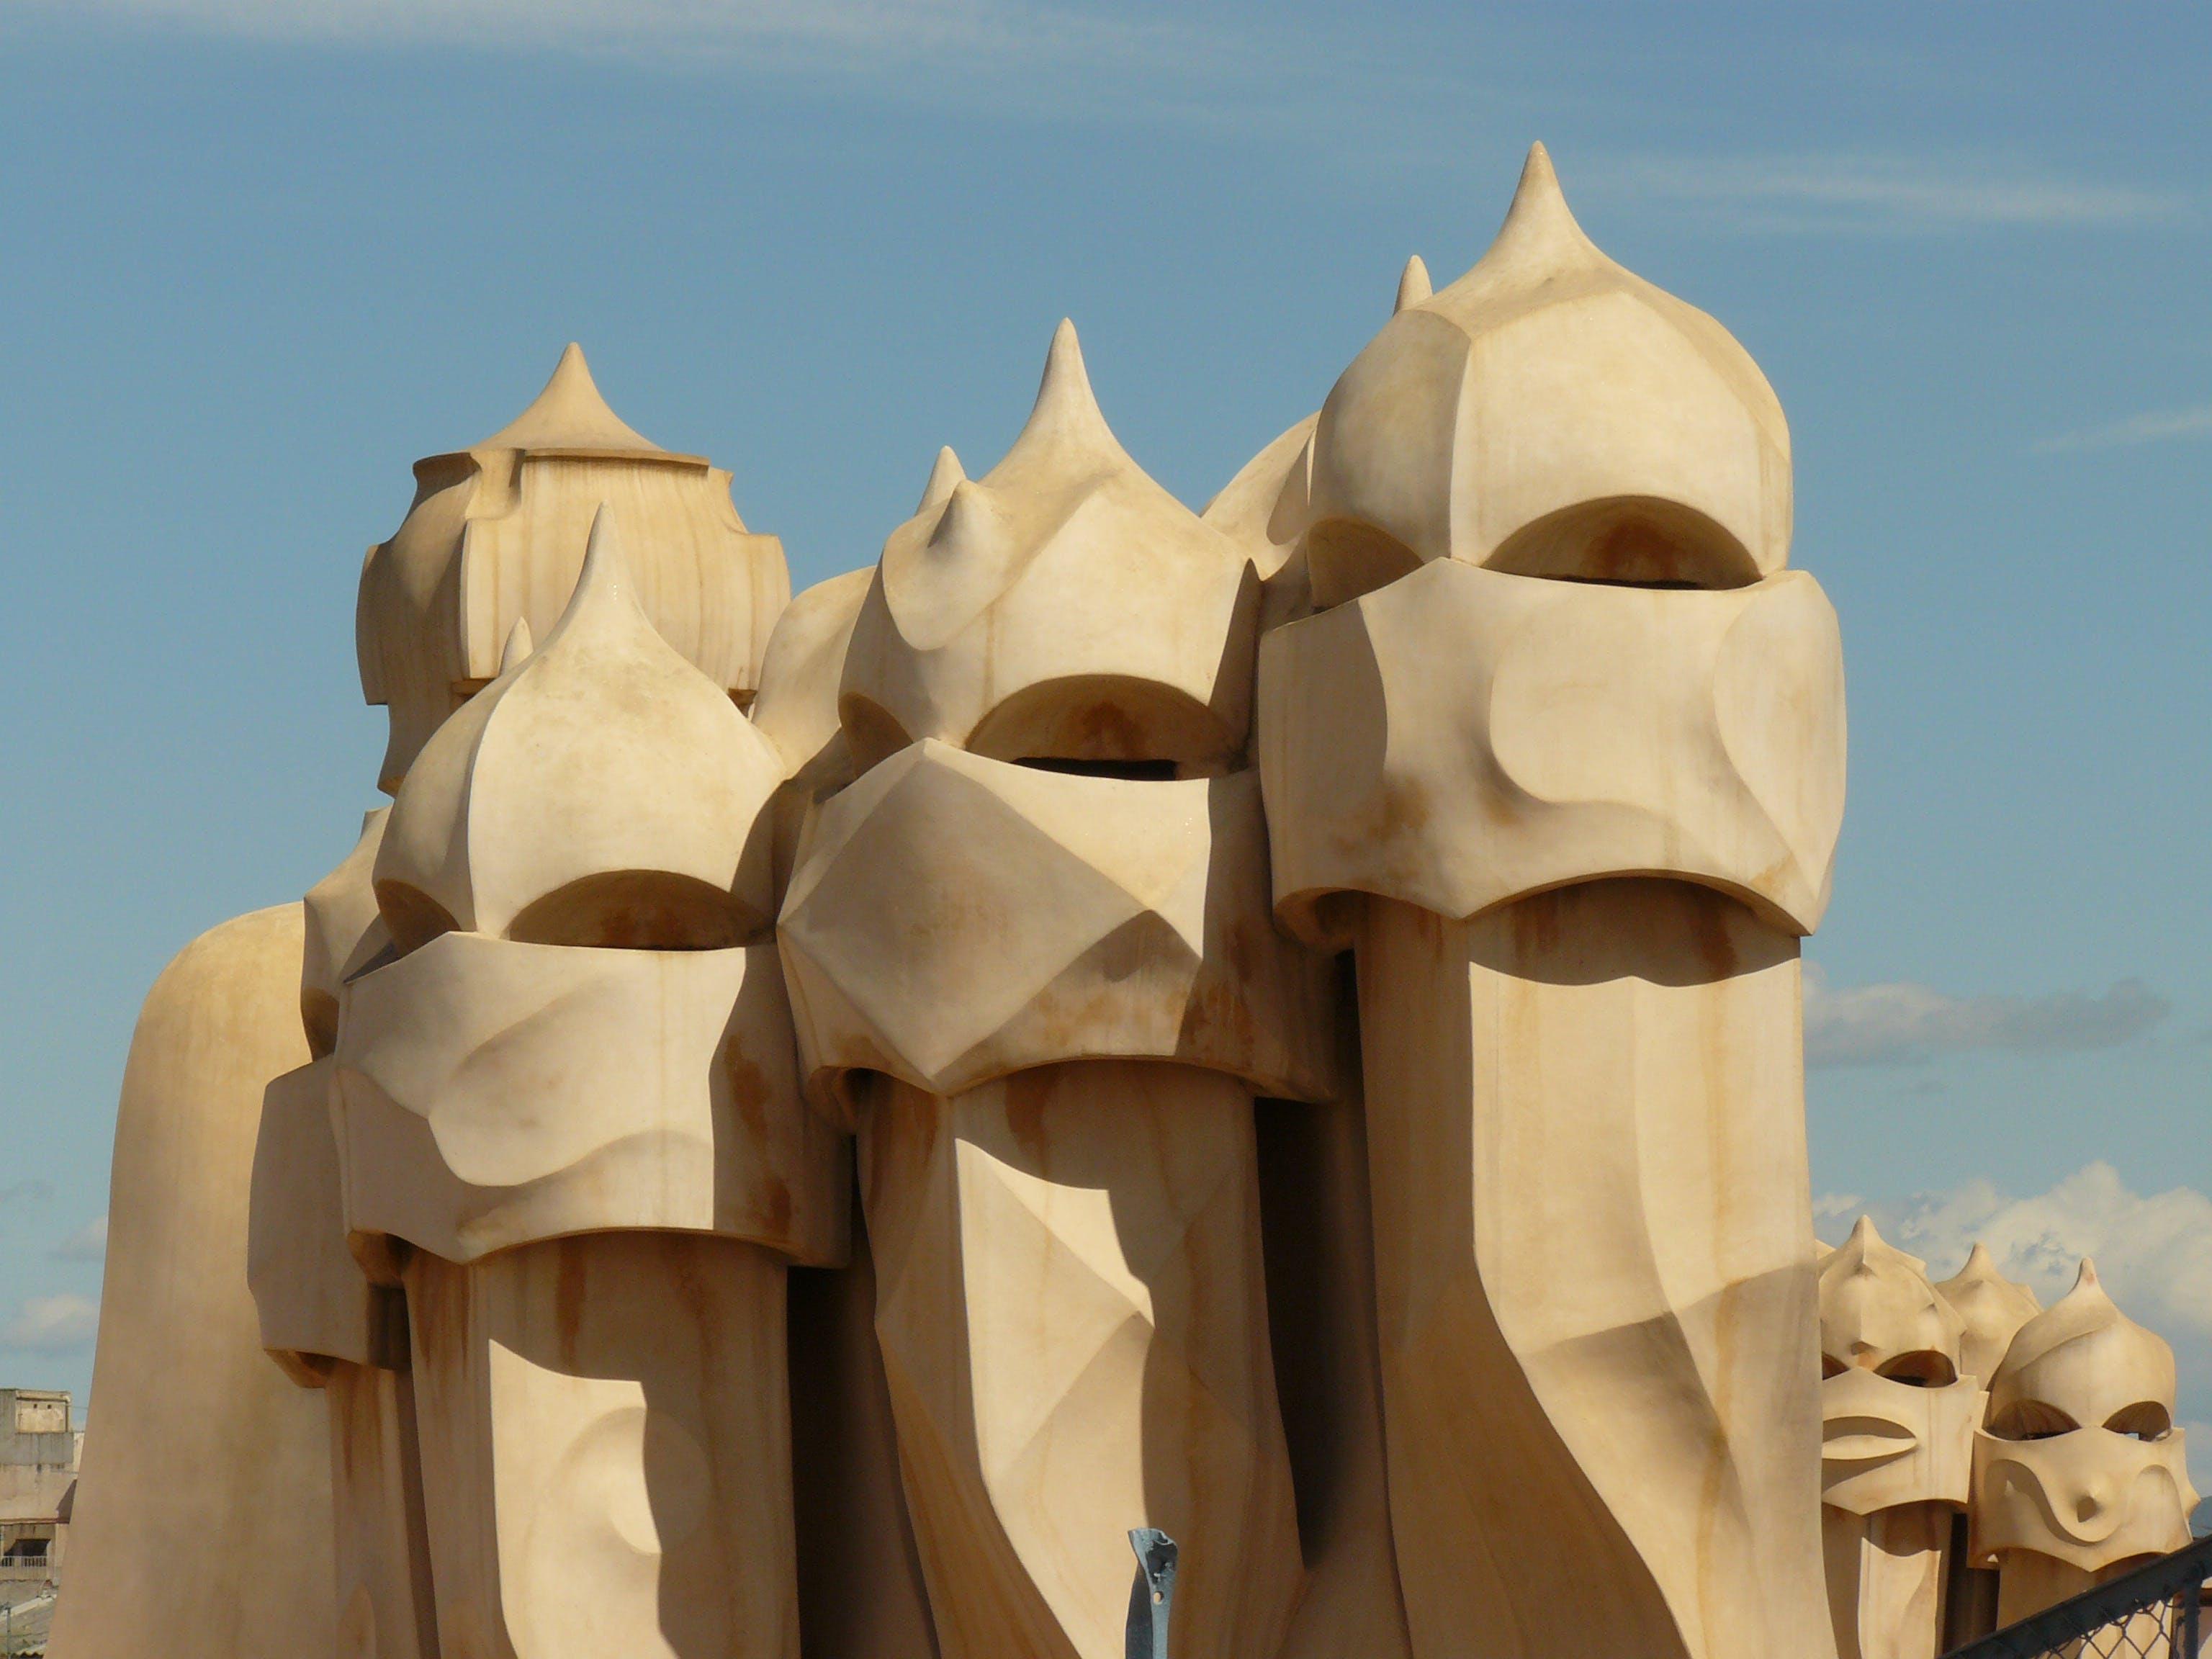 Brown Wooden Sculptures Close-up Photo